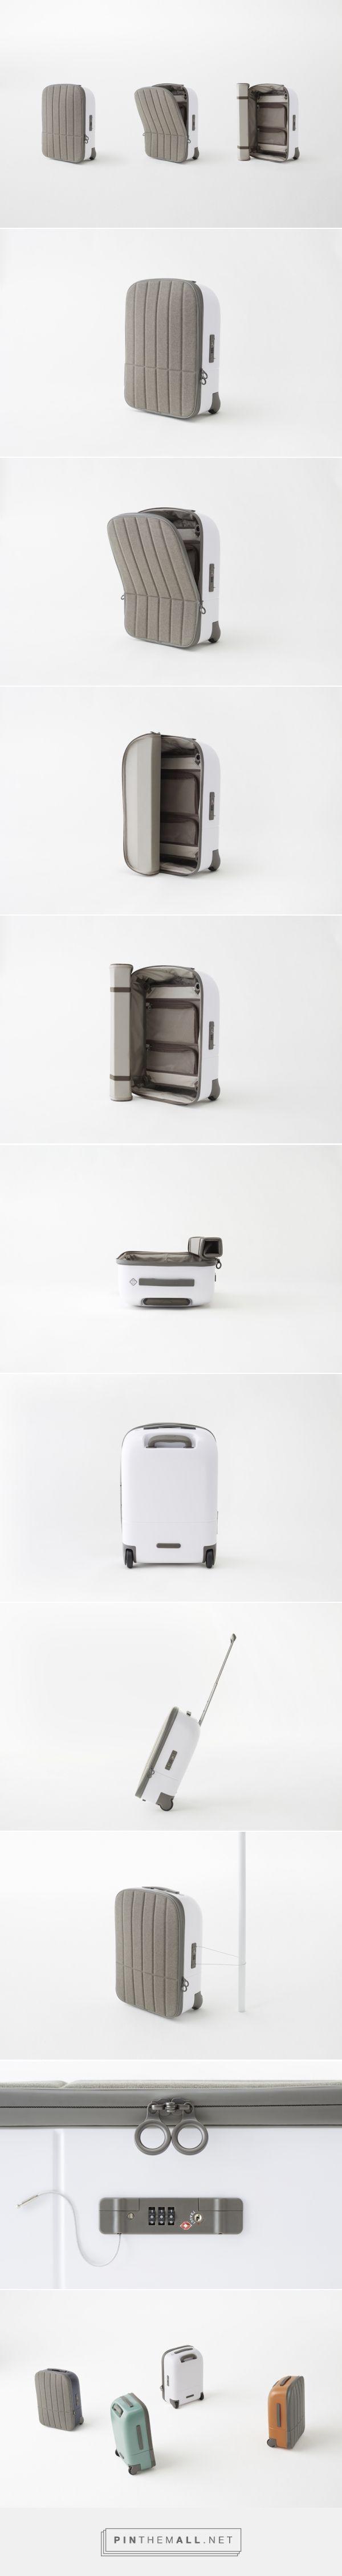 kamen suitcase for Fabbrica Pelletterie Milano - http://en.fpm.it/content/travel-hand_luggage | Designer: Nendo